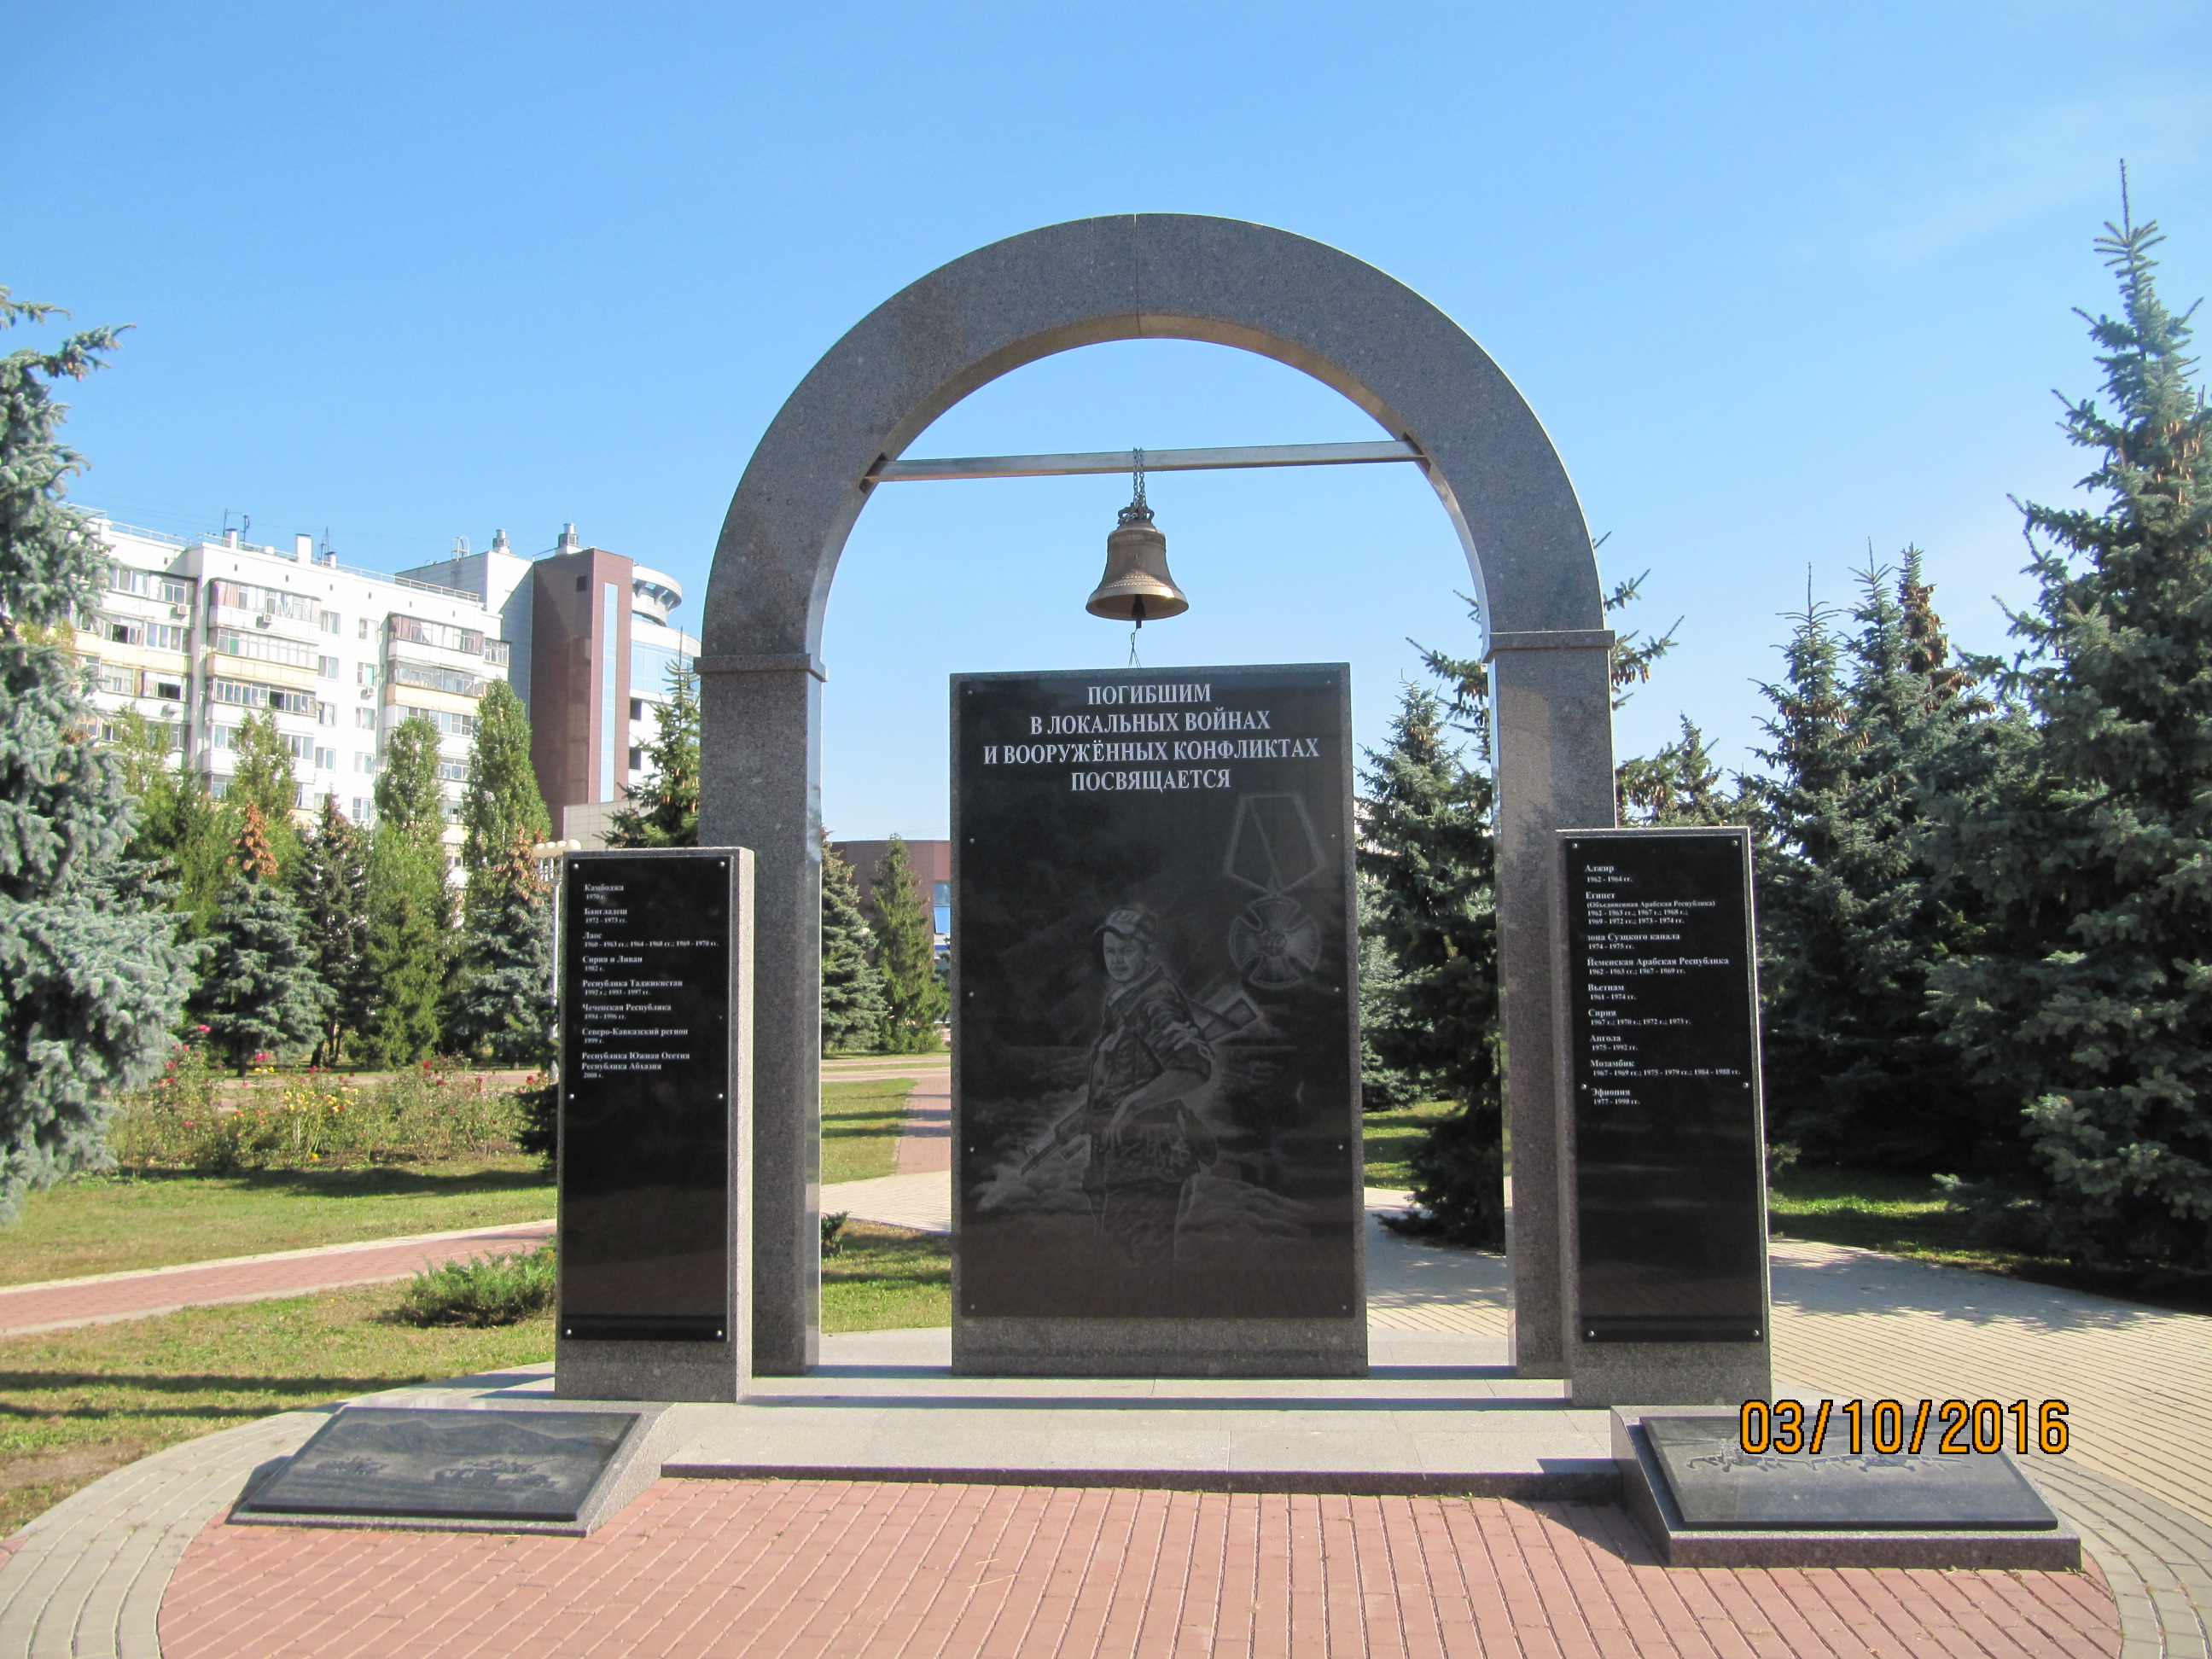 http://se.uploads.ru/k2Z7S.jpg